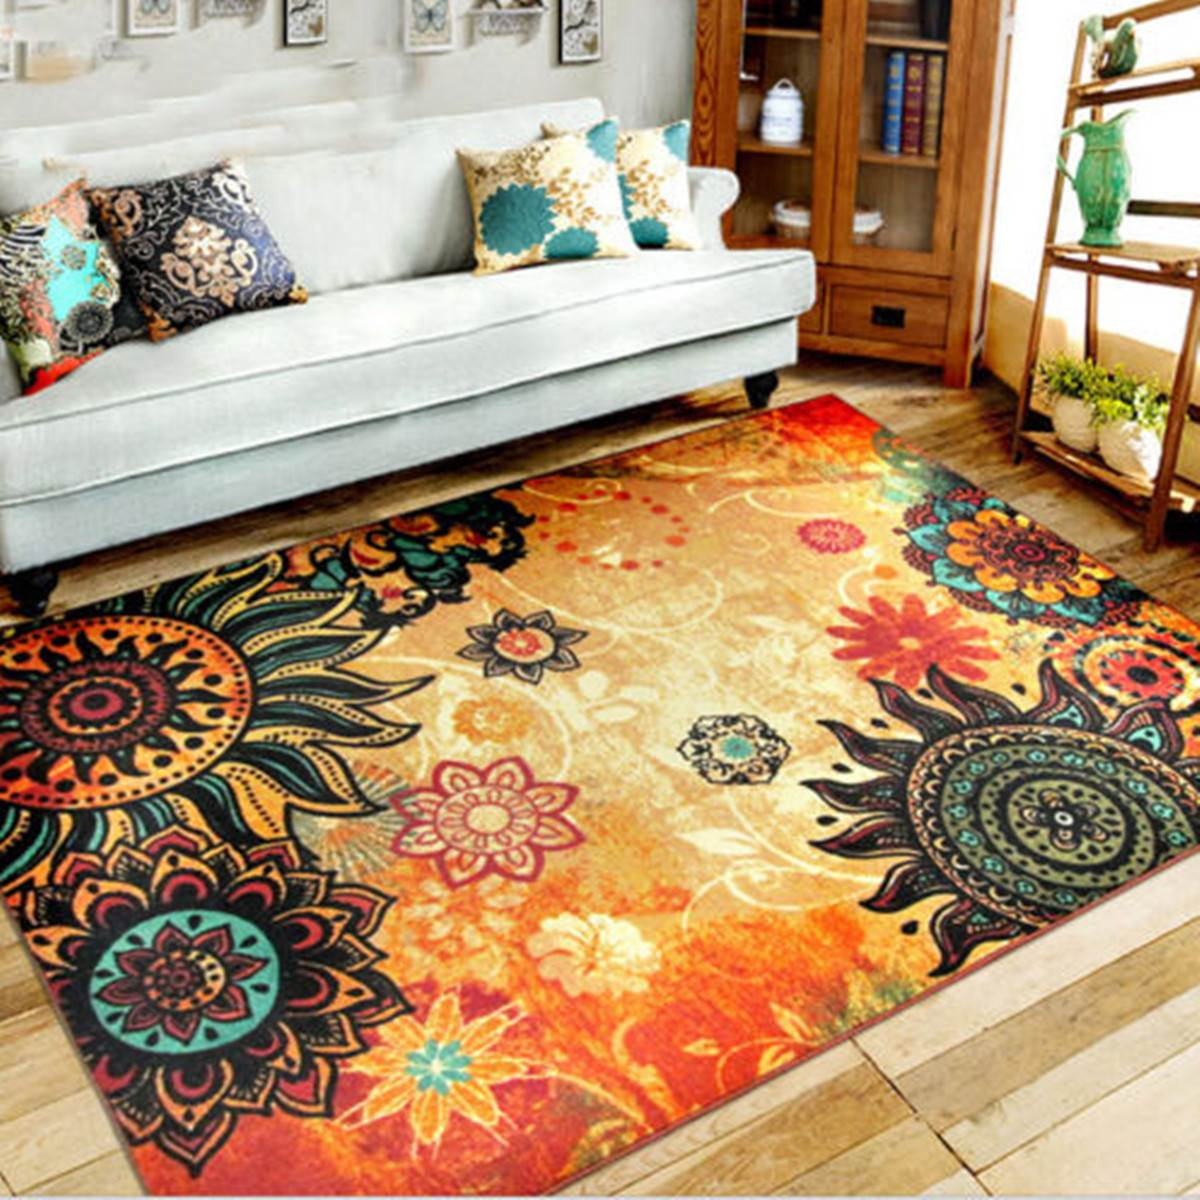 Retro Carpet Bohemia Style Rug Floor Mat Blanket Fluffy Anti Skid Shaggy  Area Home Bedroom